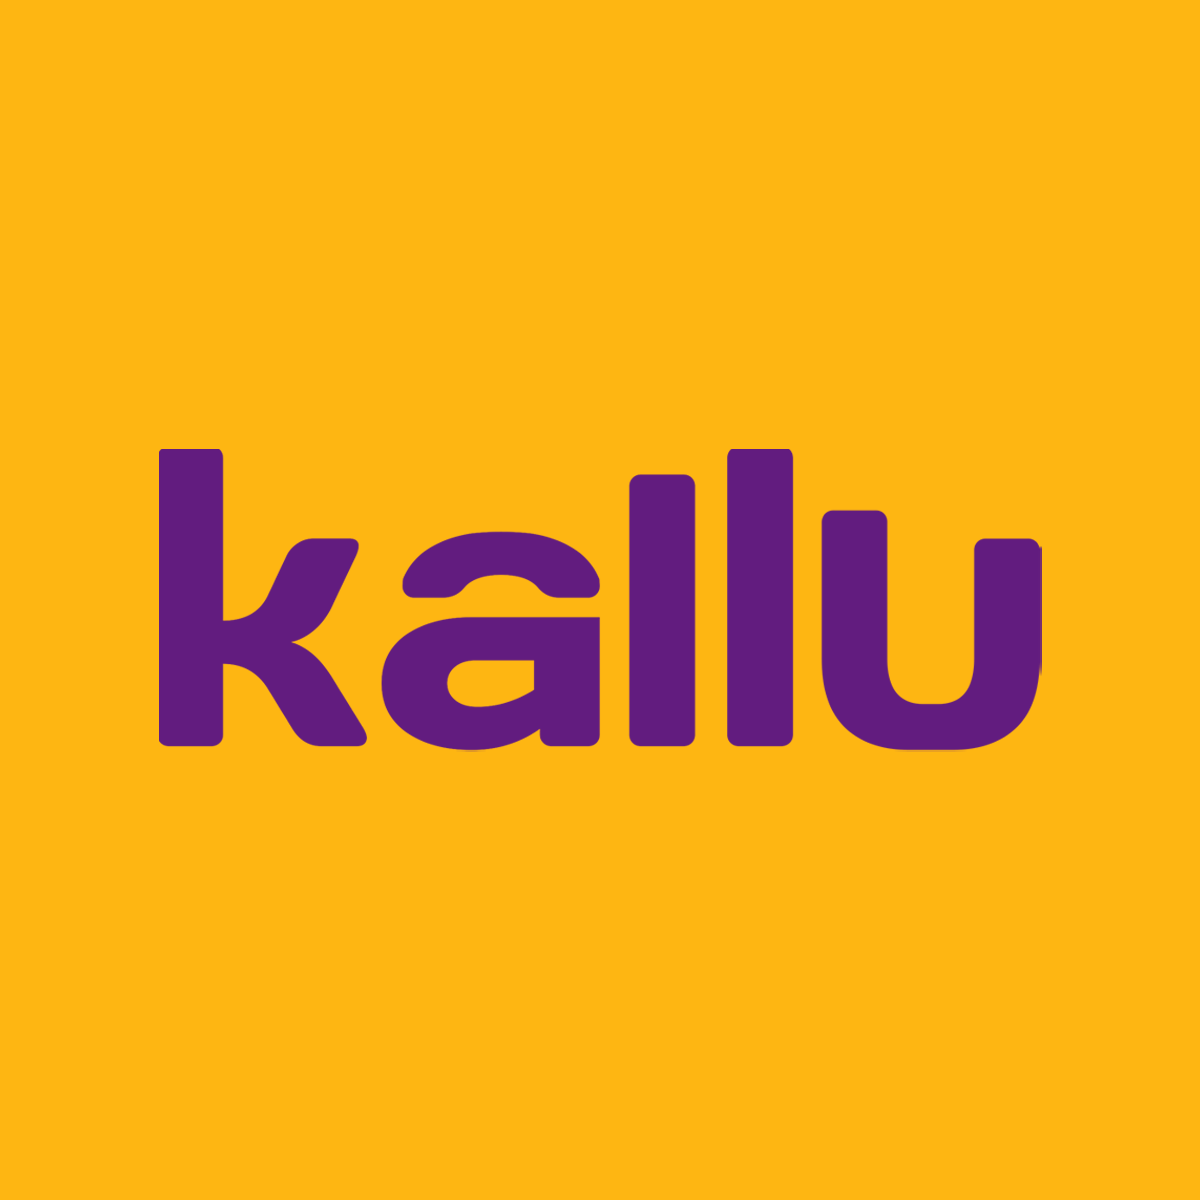 Kallu